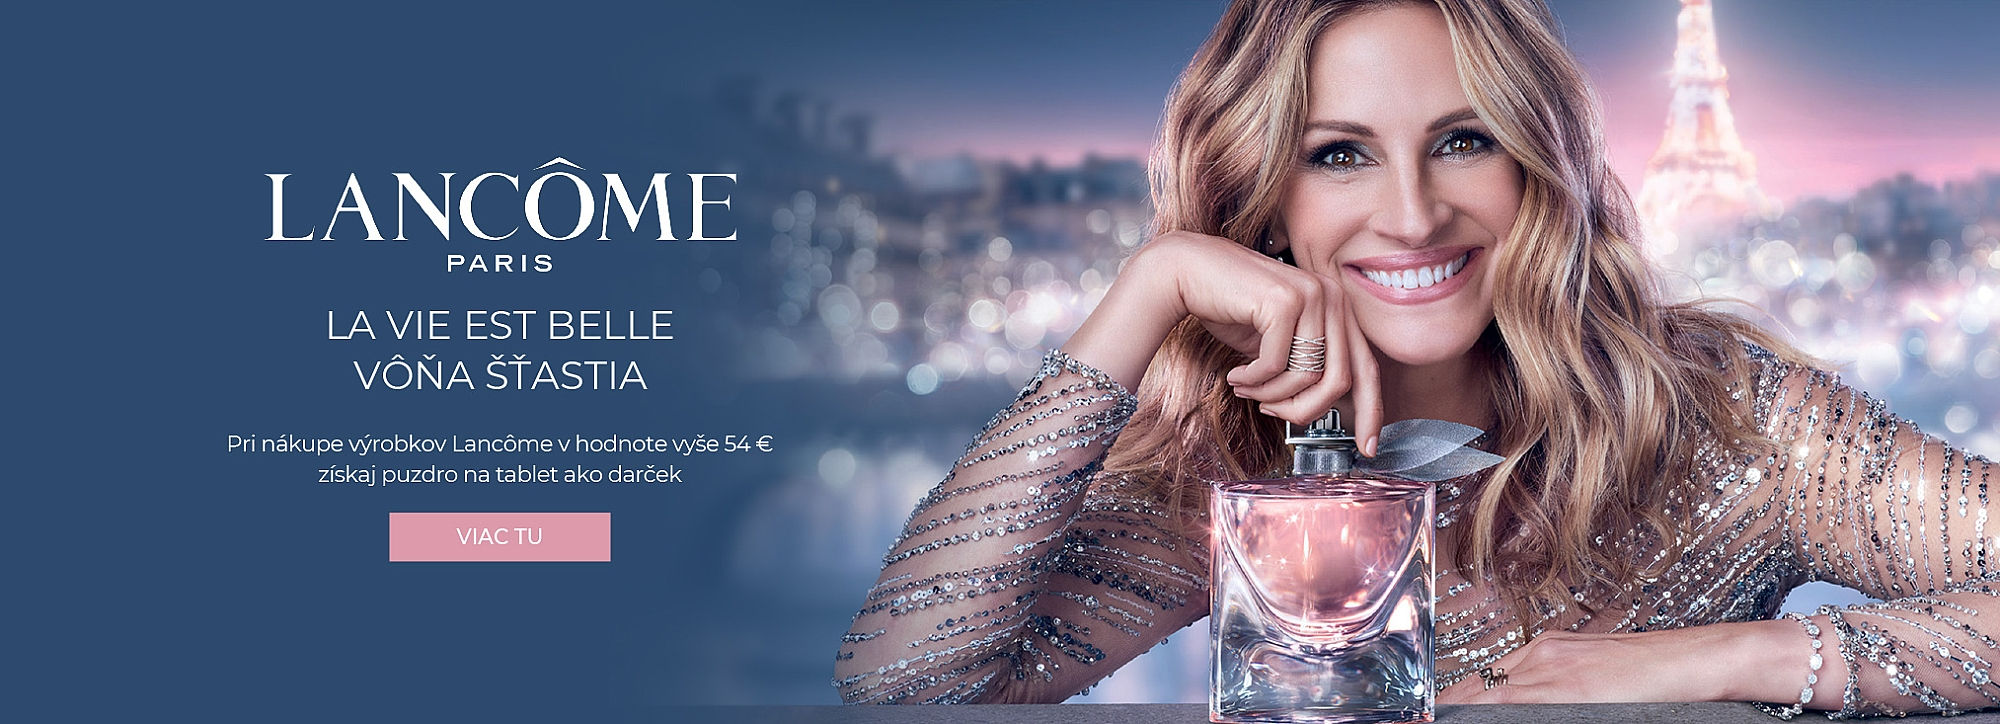 Lancôme_parfums